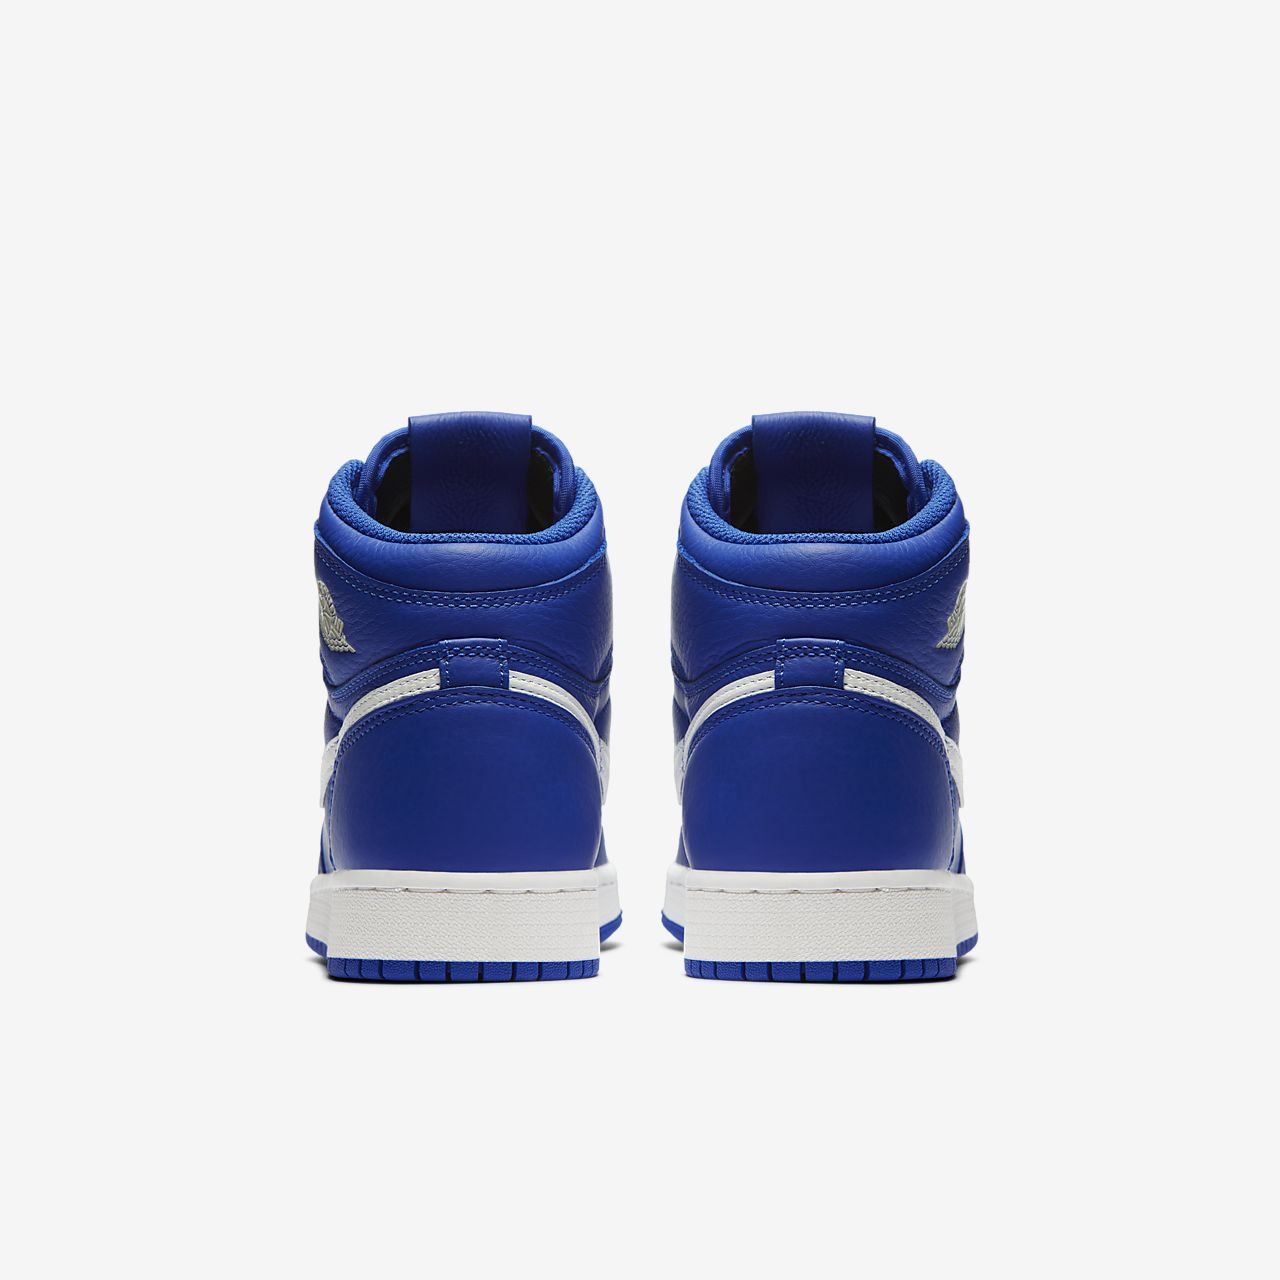 online store fa345 727ef ... Air Jordan 1 Retro High OG Jungenschuh